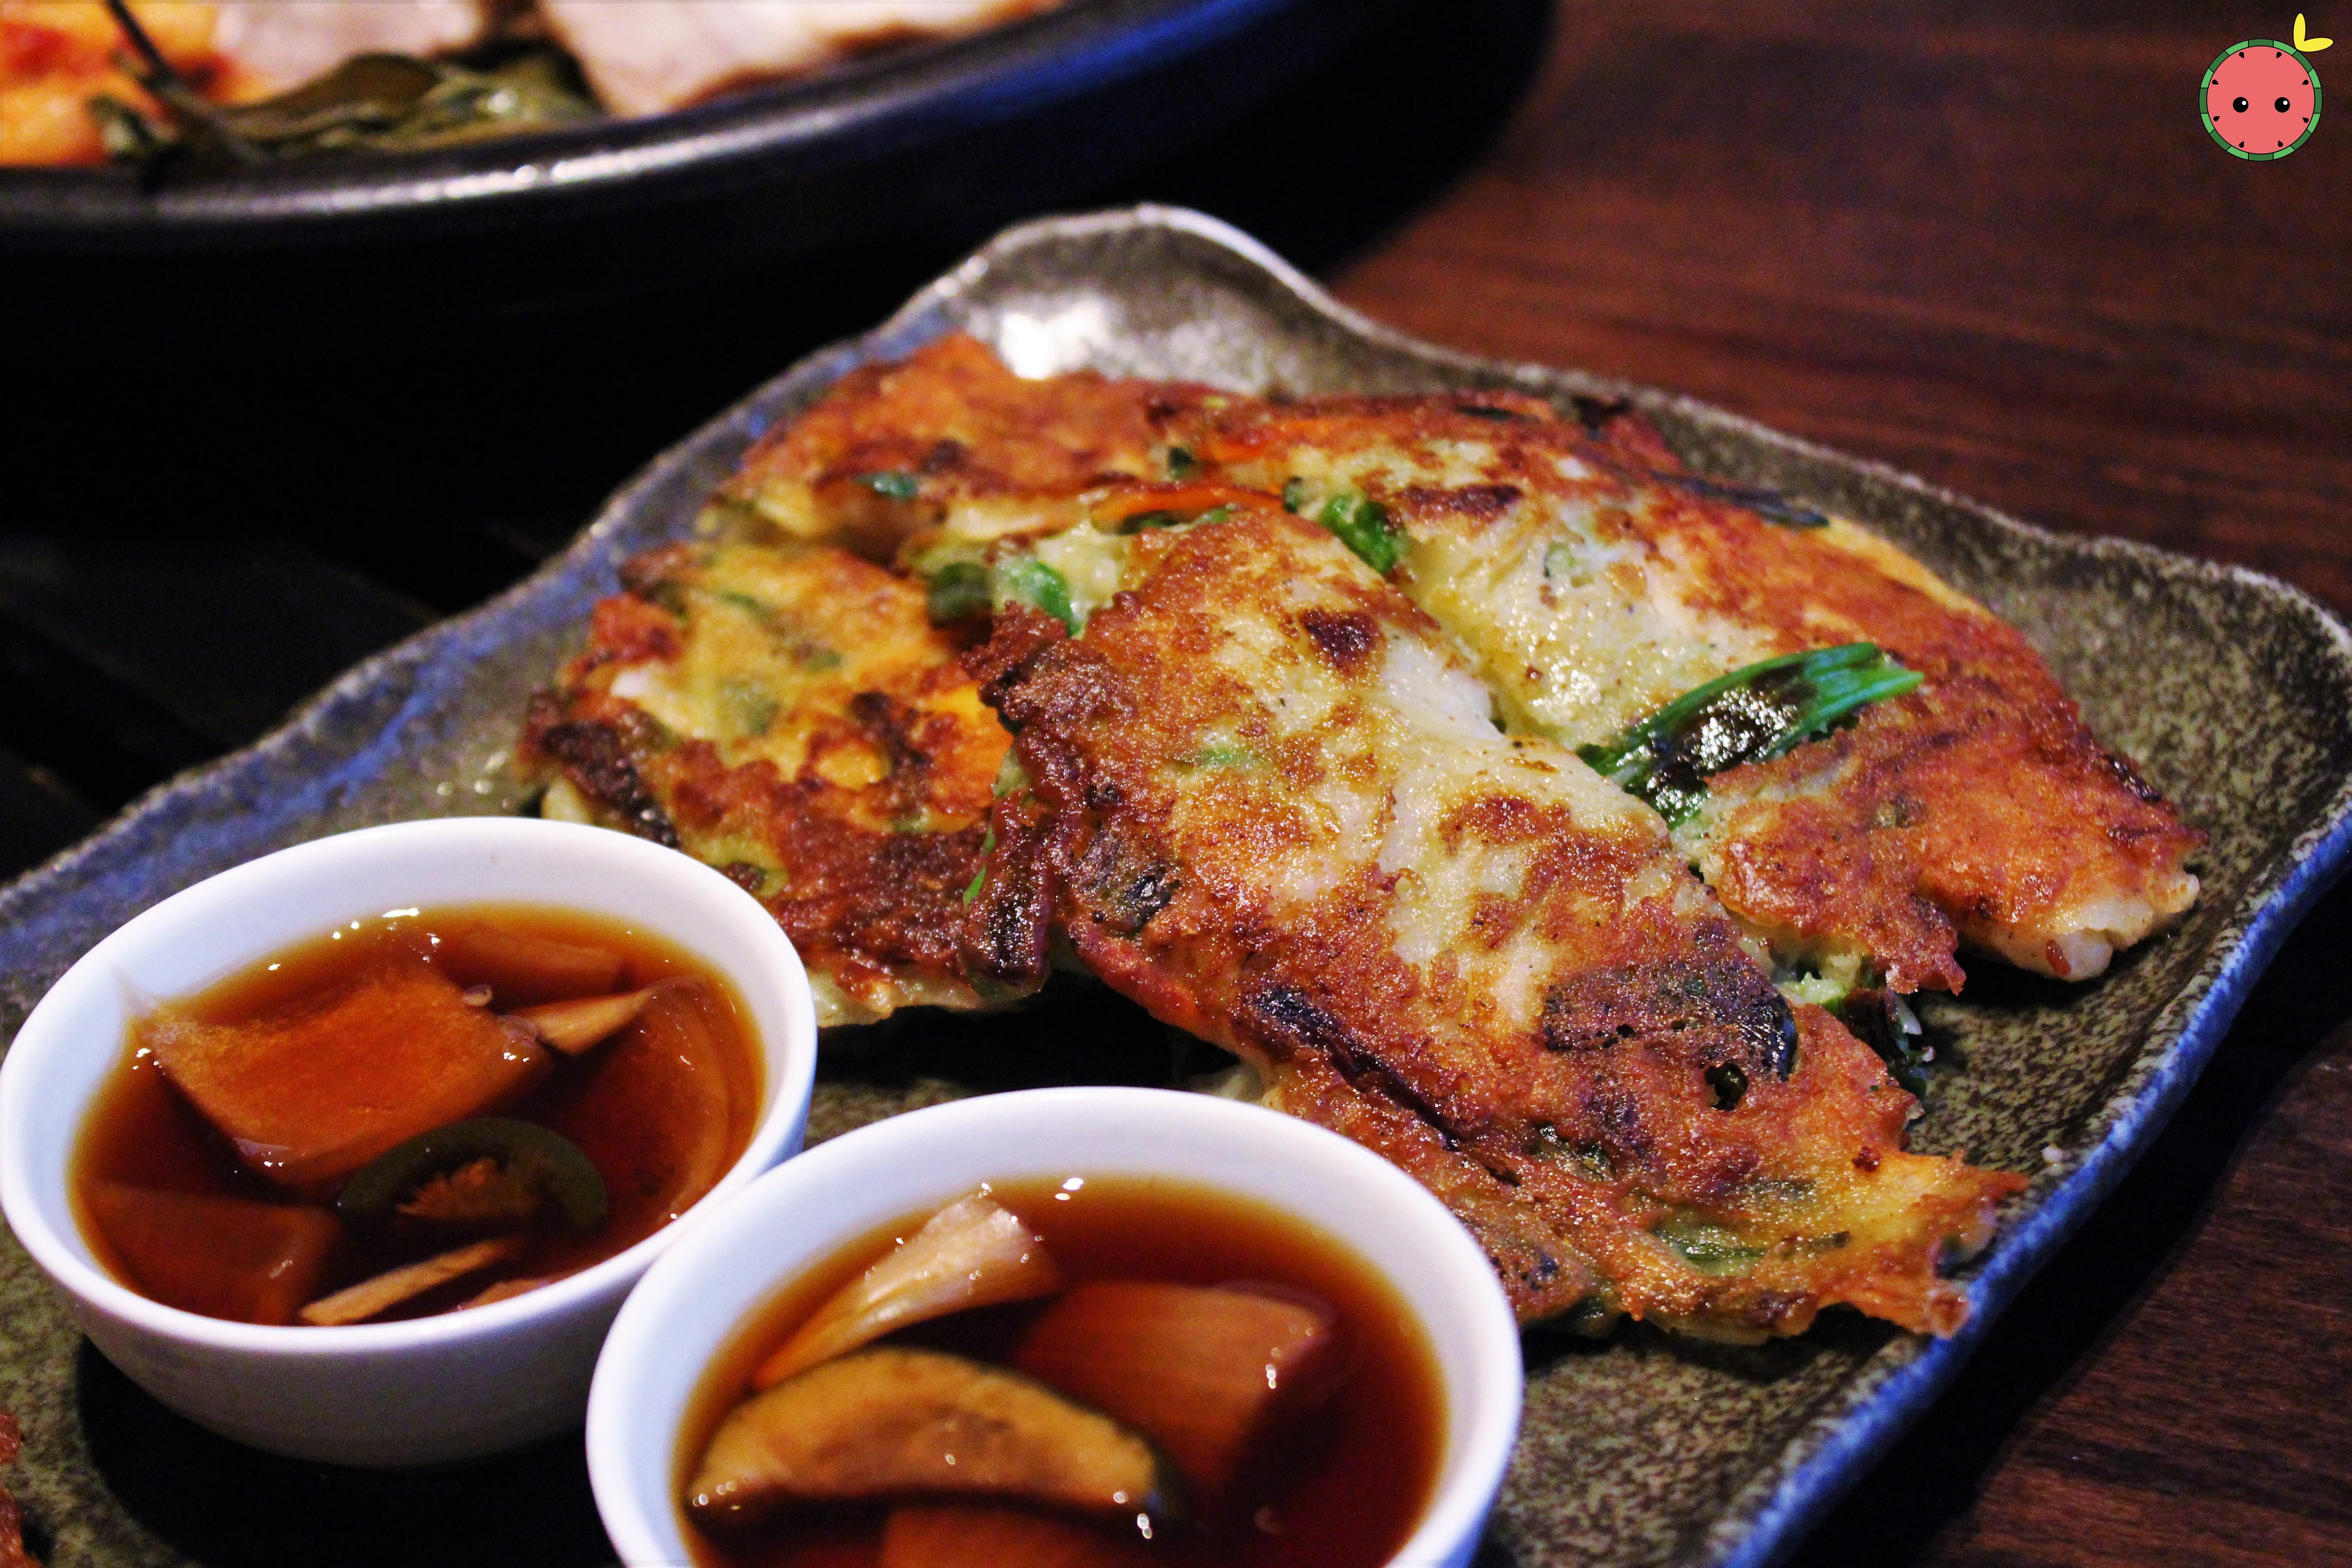 Haemul Pajun - Scallion pancake with calamari, clam, shrimp